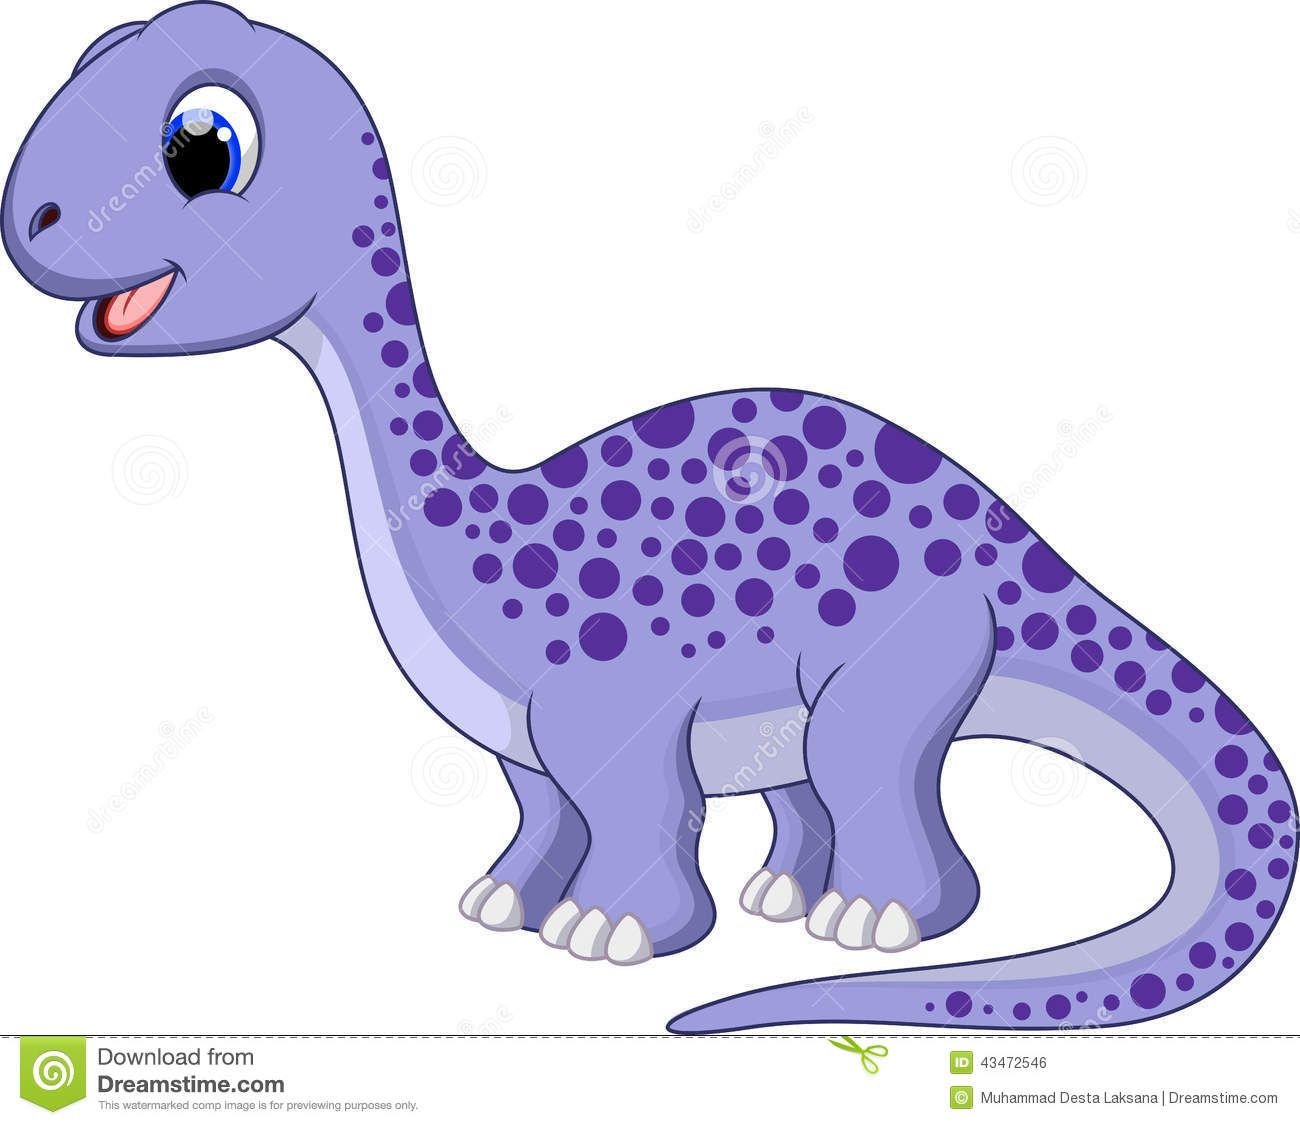 Diplodocus Face Paint Google Search Imagenes De Dinosaurios Infantiles Imagenes De Dinosaurios Animados Dinosaurio Rex Dibujo